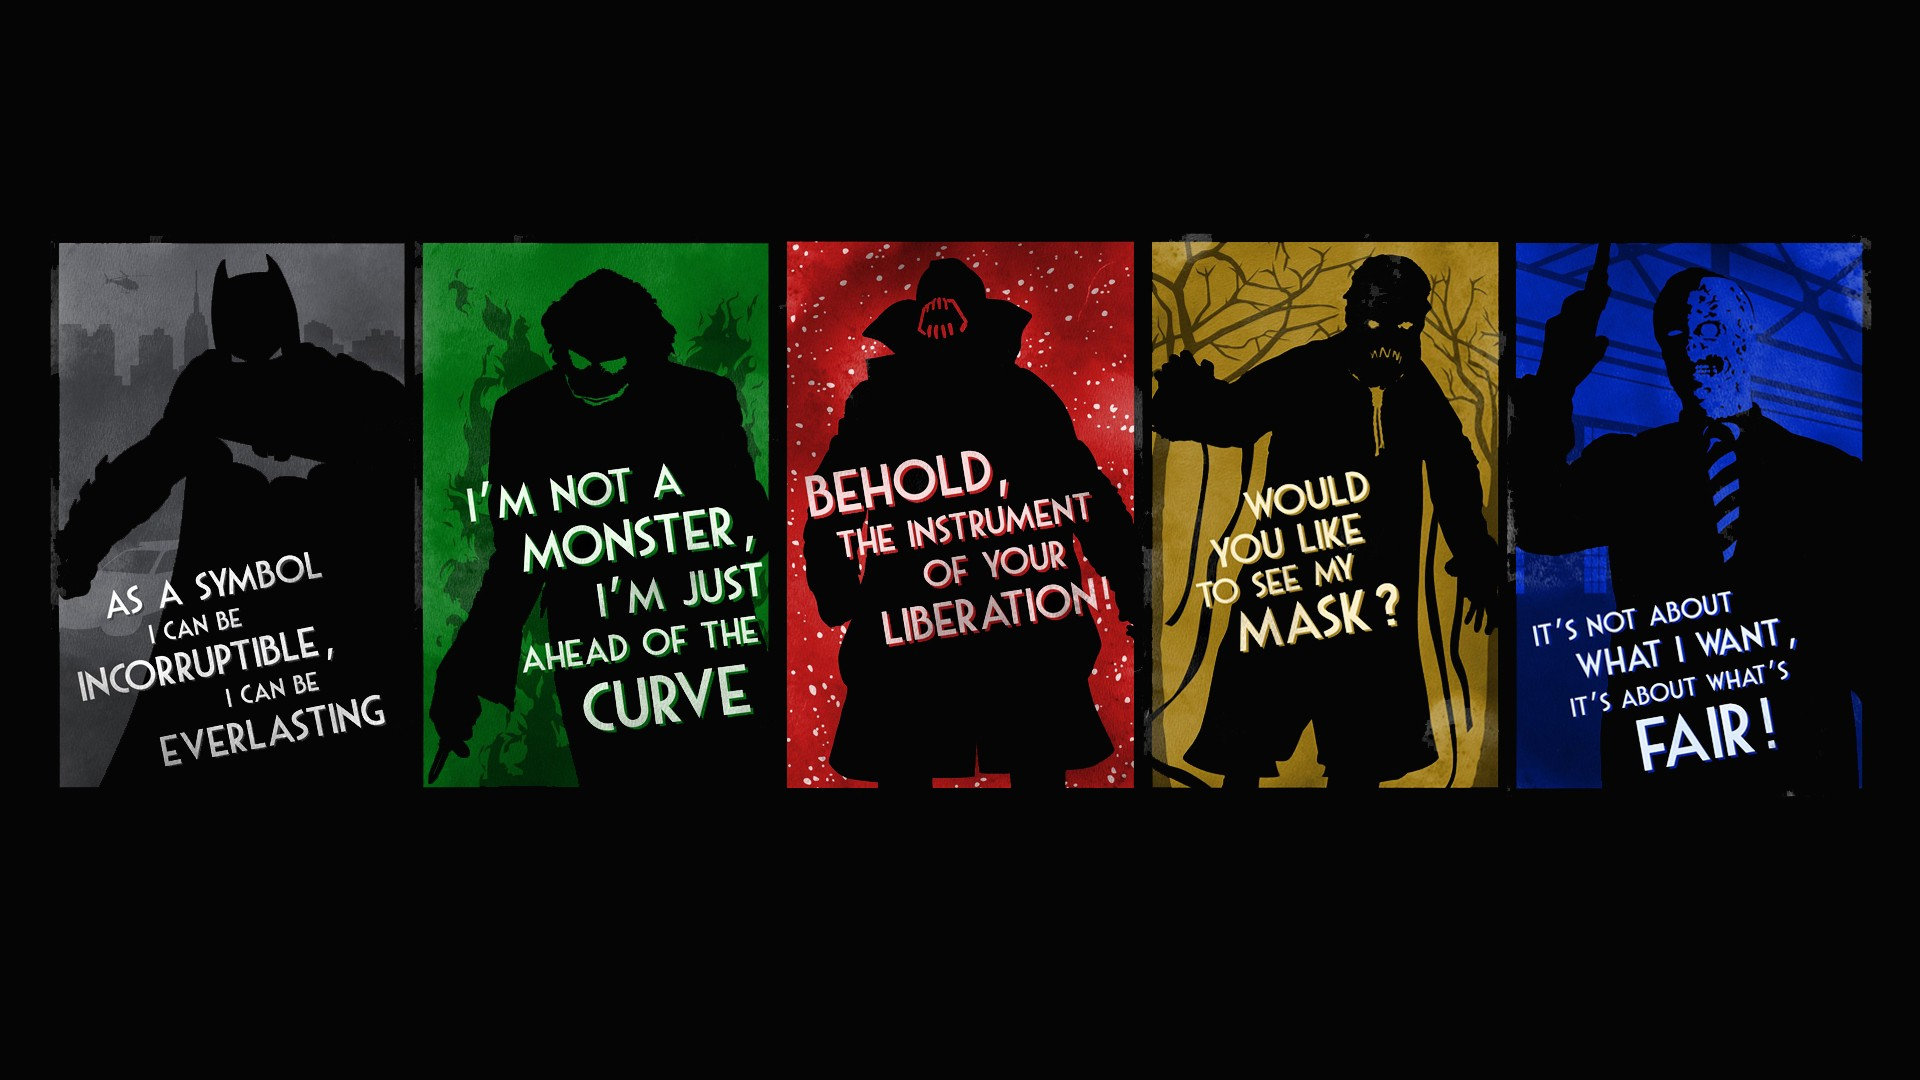 Batman quote #7